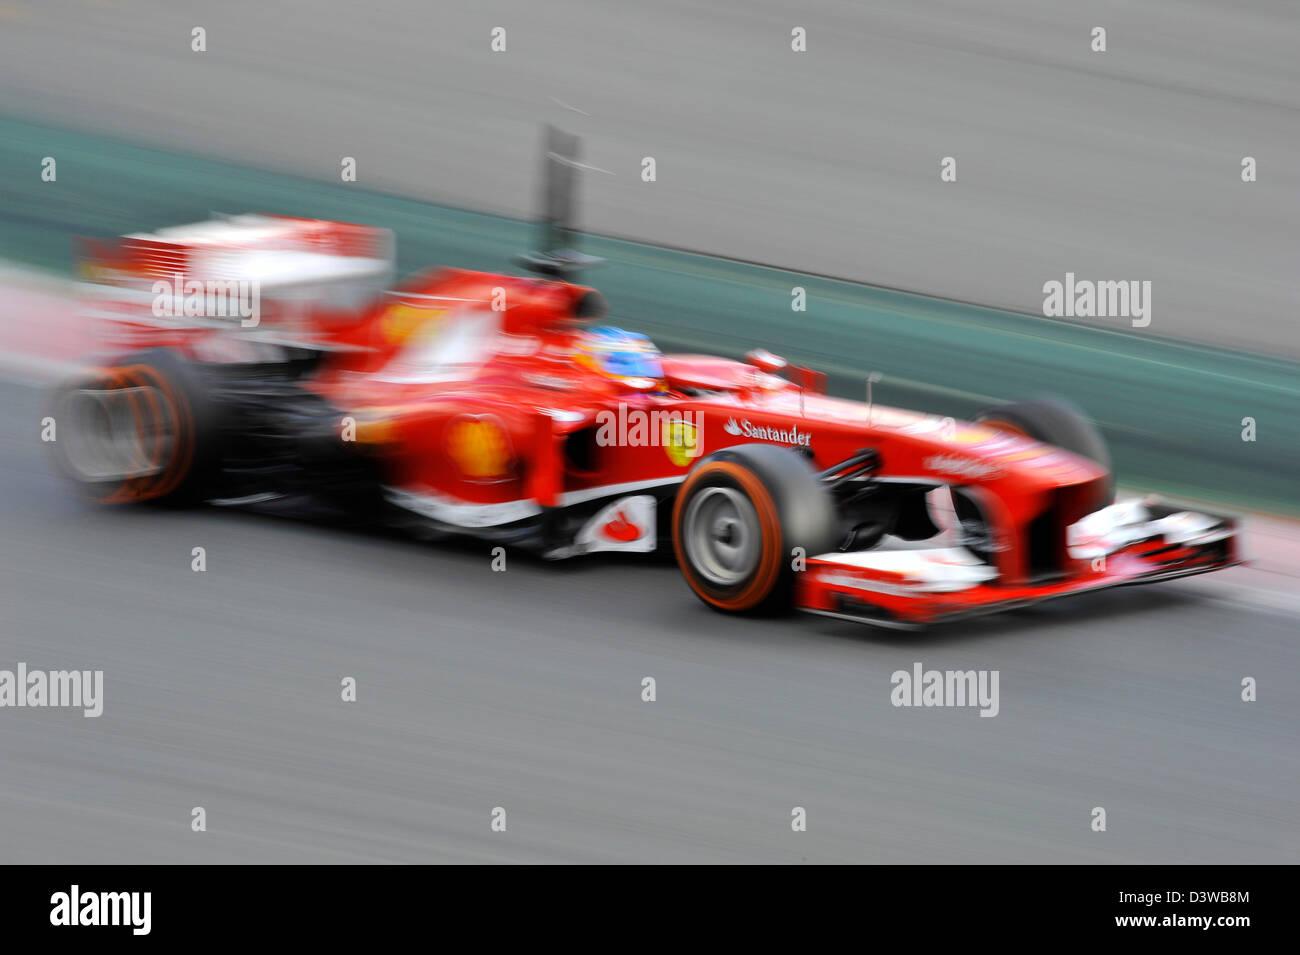 Circuito Fernando Alonso : Fernando alonso esp ferrari f138 durante las pruebas de fórmula